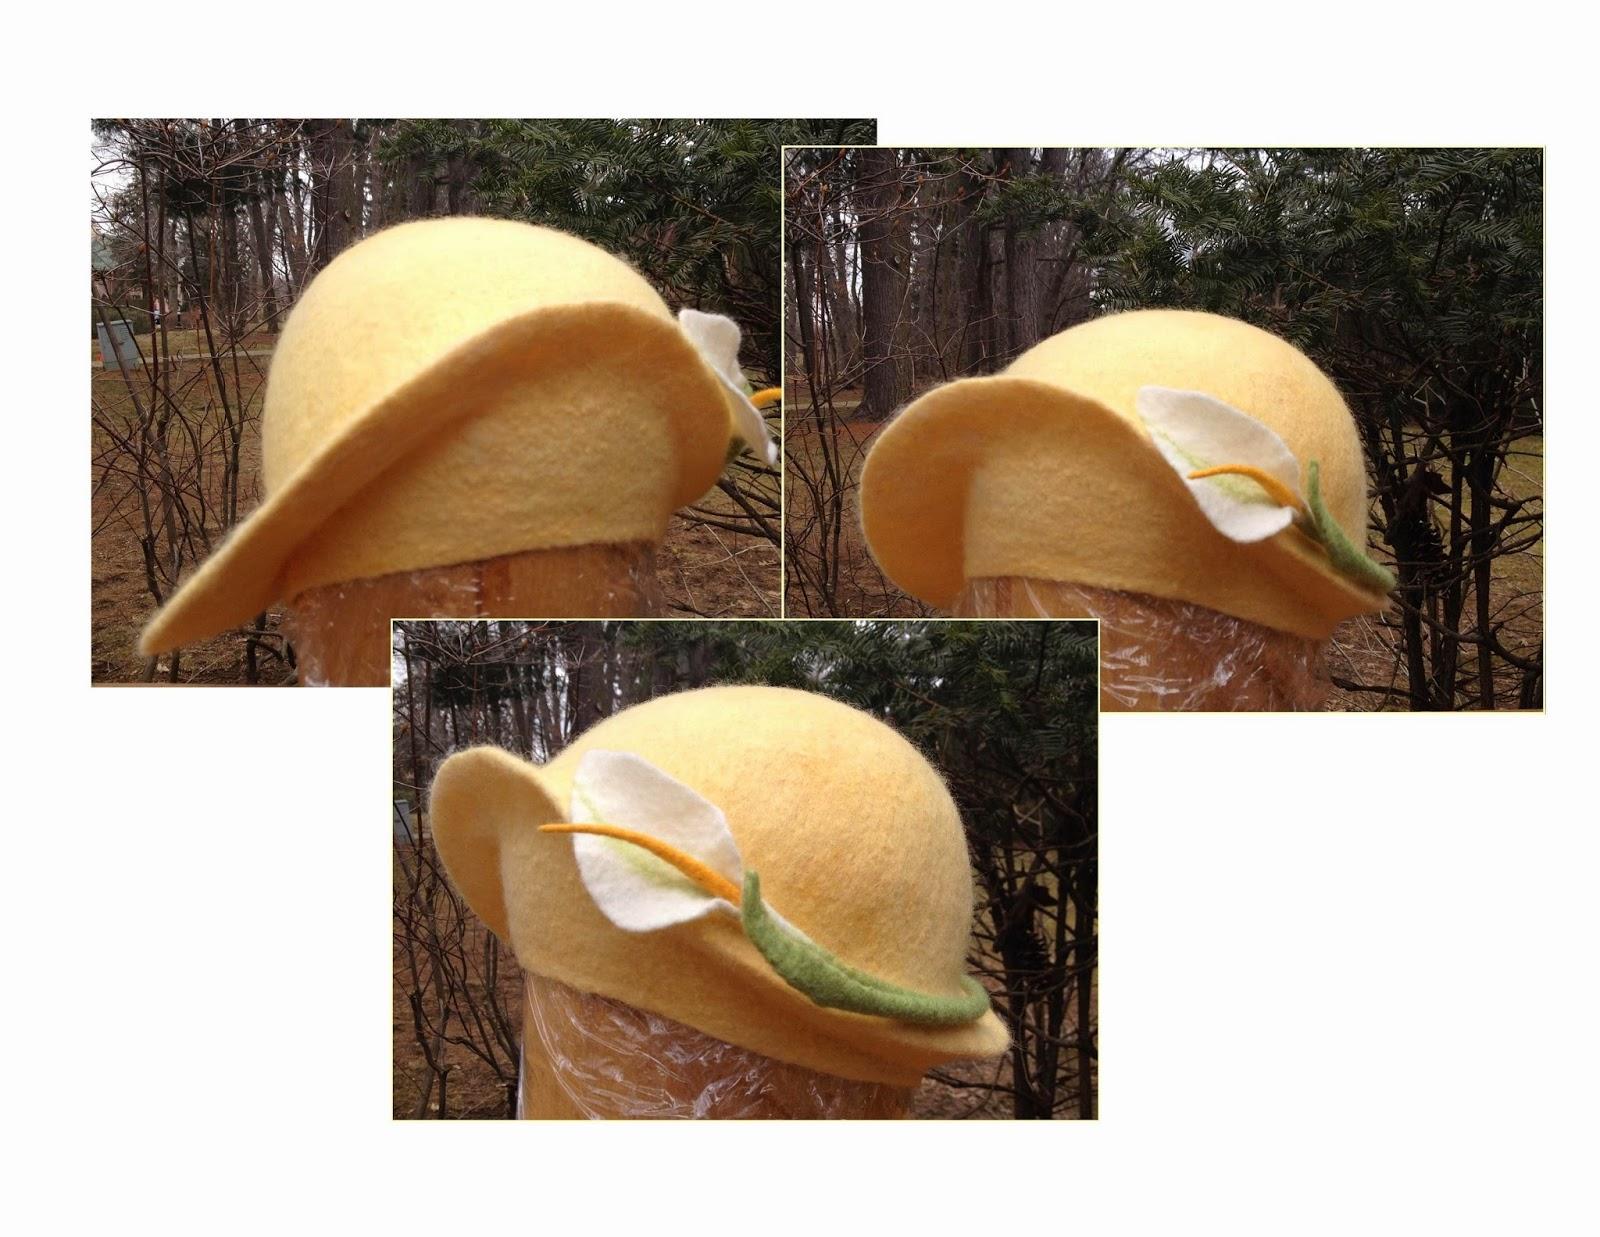 Fine Fiber Art: Hats, Headbands & Head Accessories